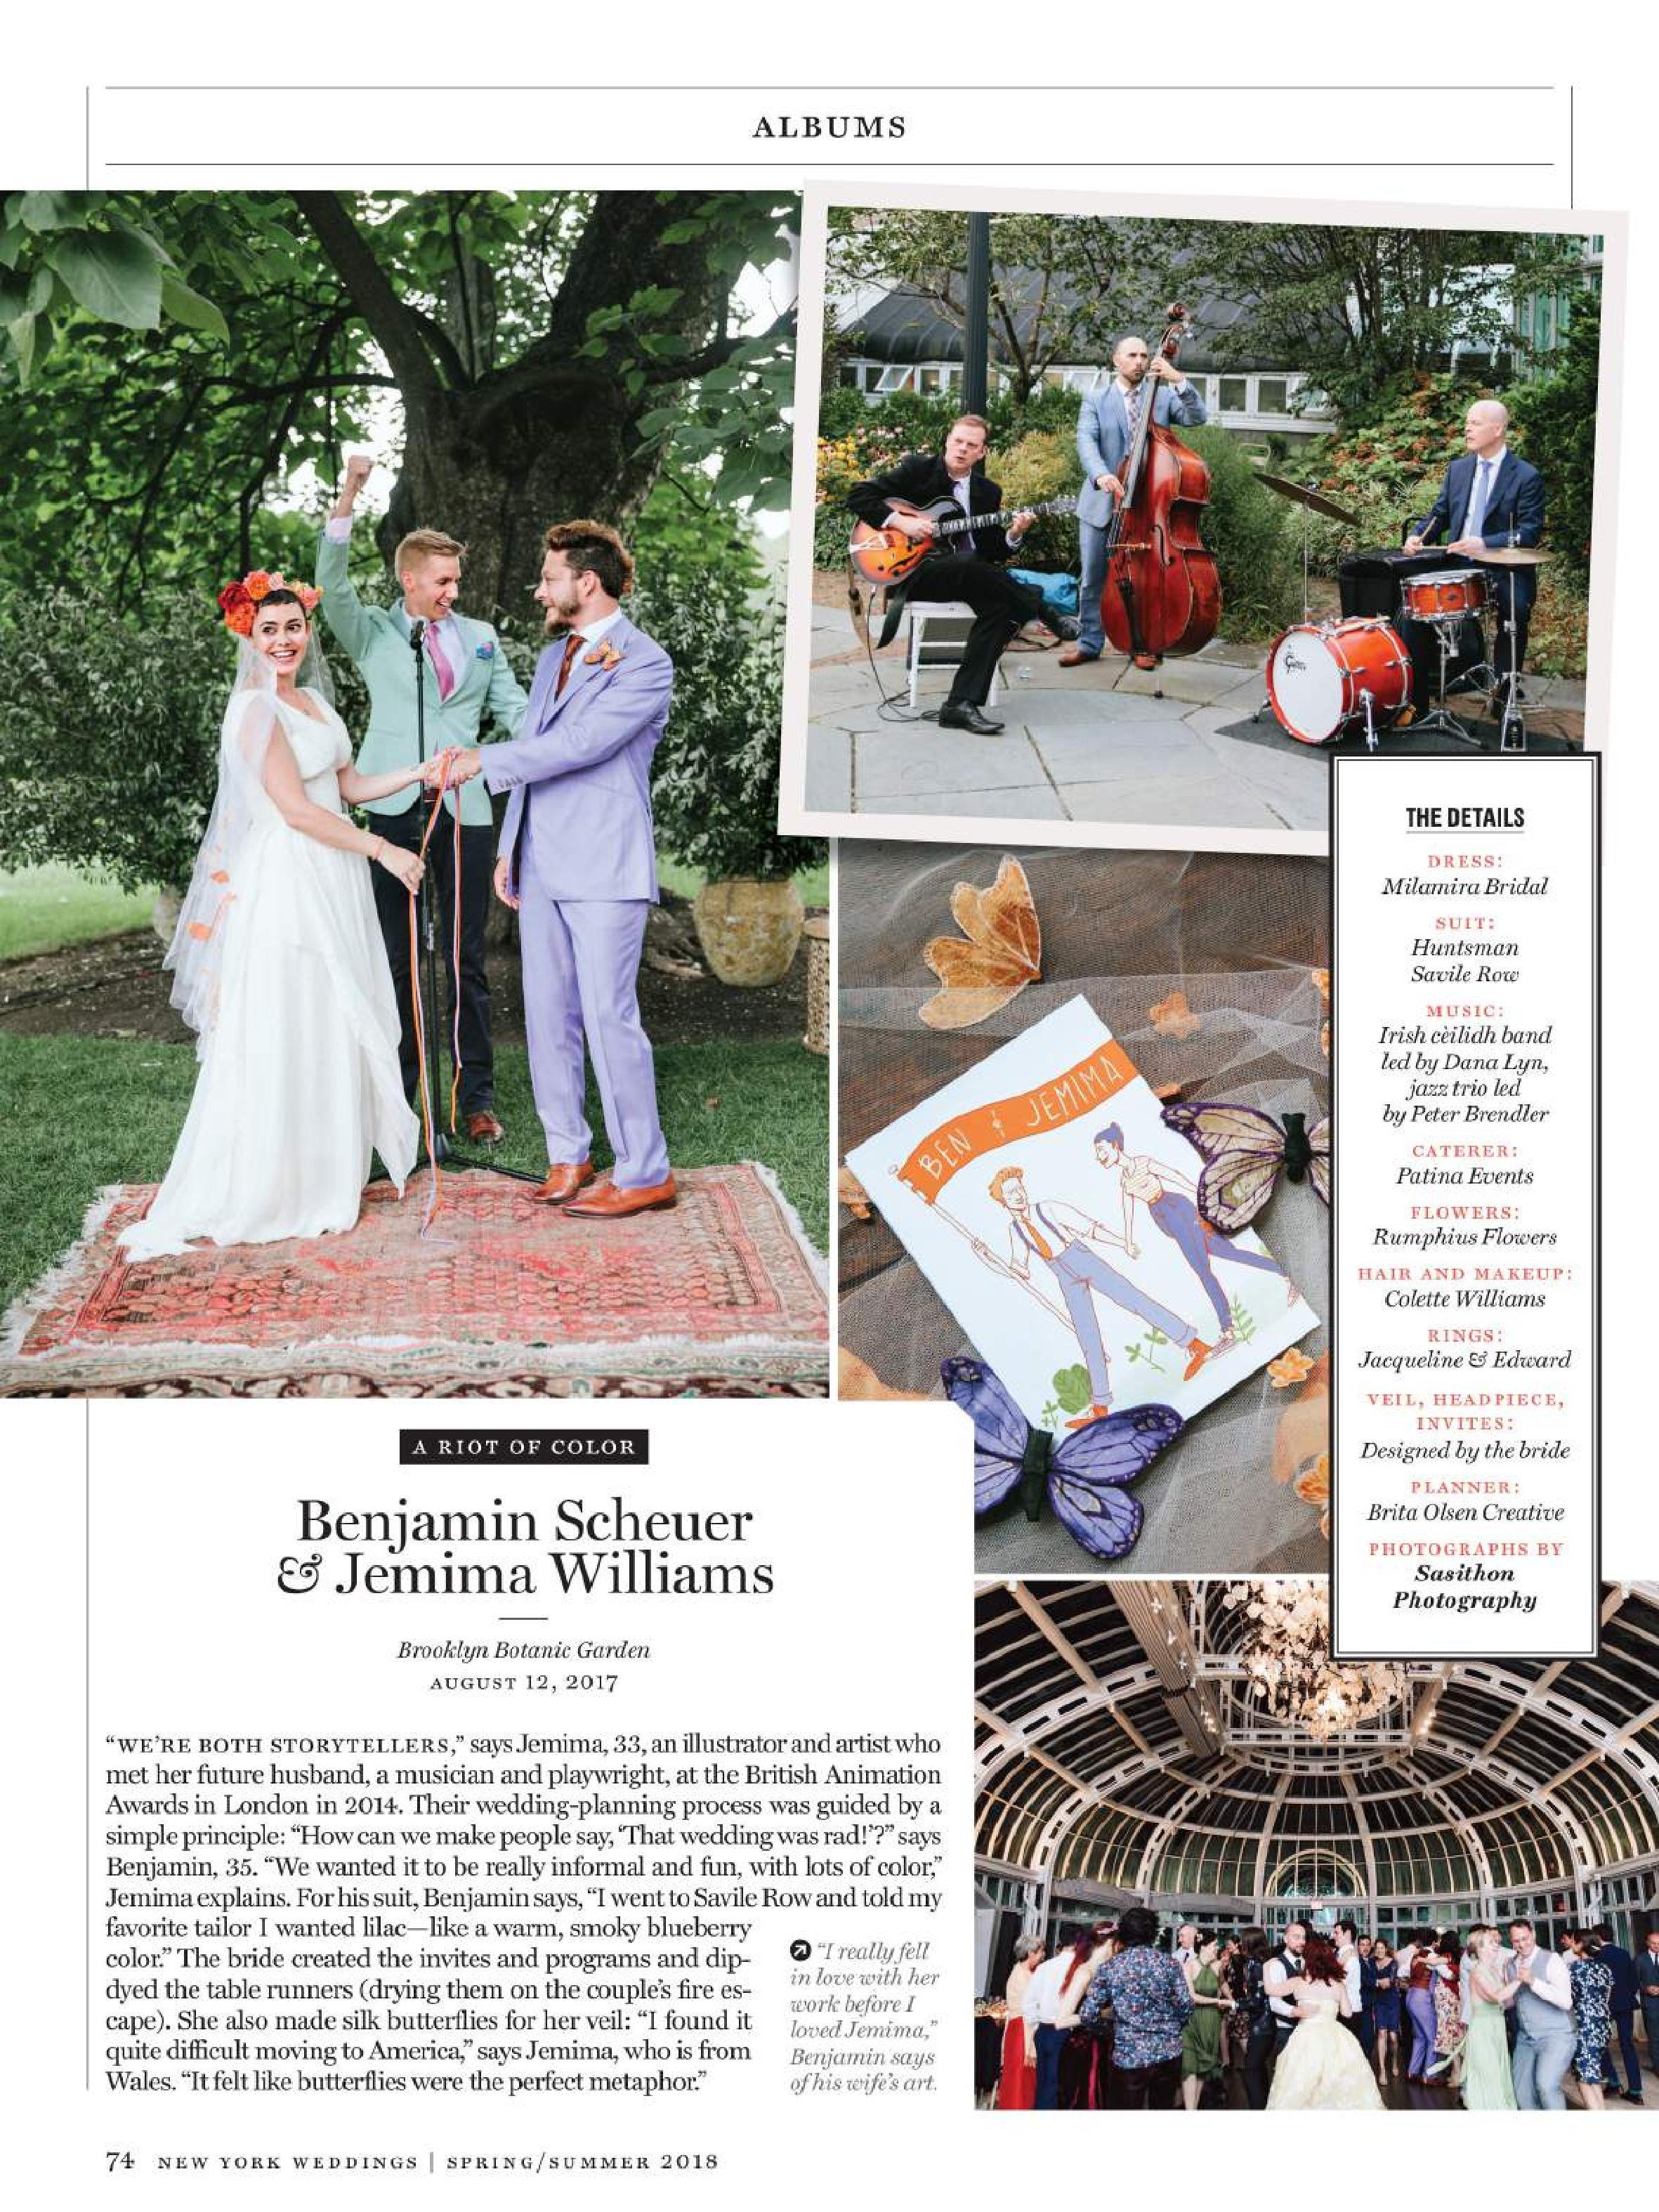 SS Weddings 18 Sasithon.compressed-page-003.jpg